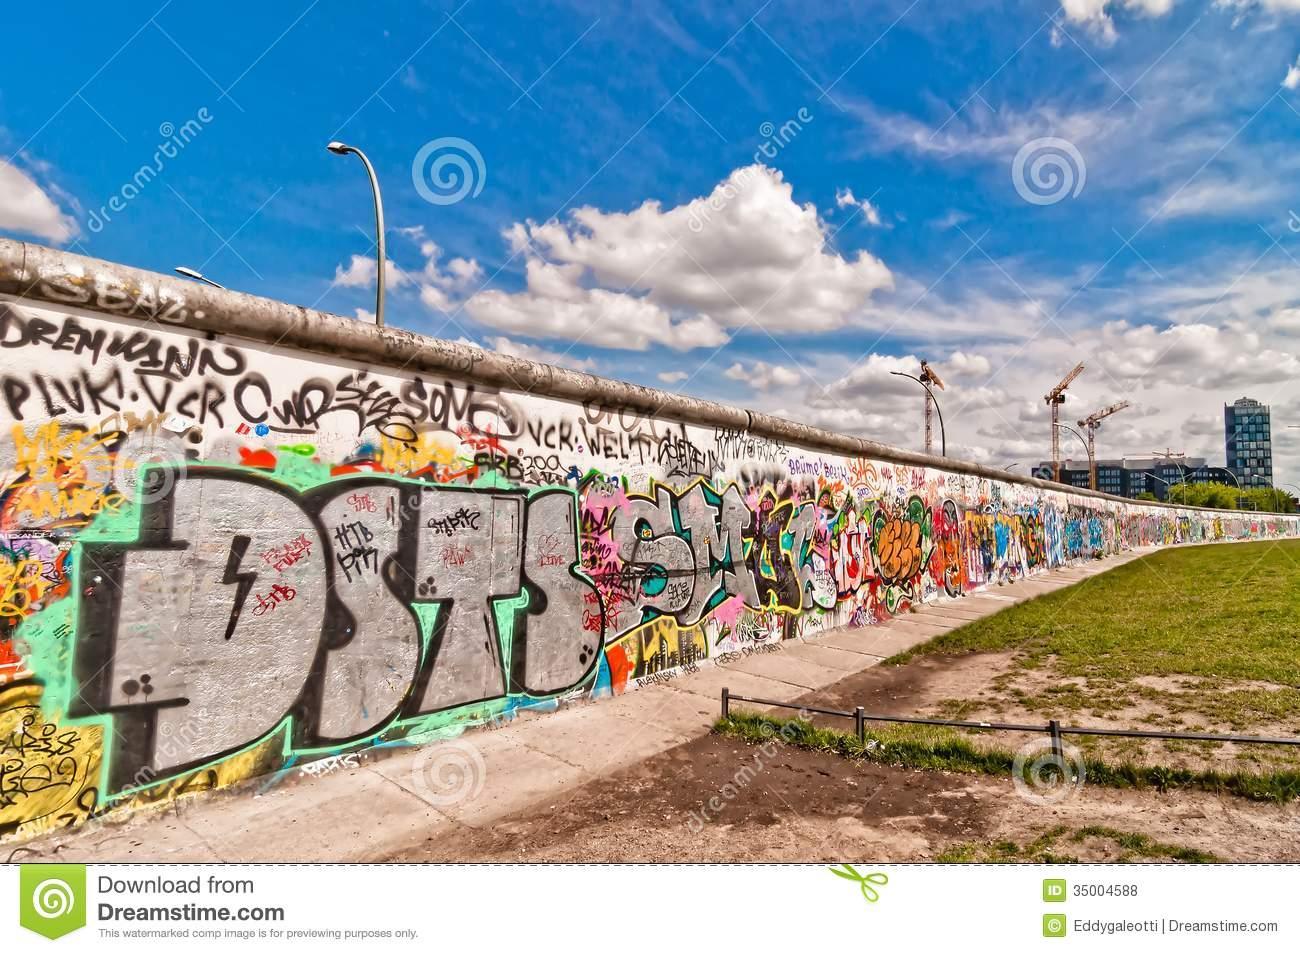 Berlin wall clipart.